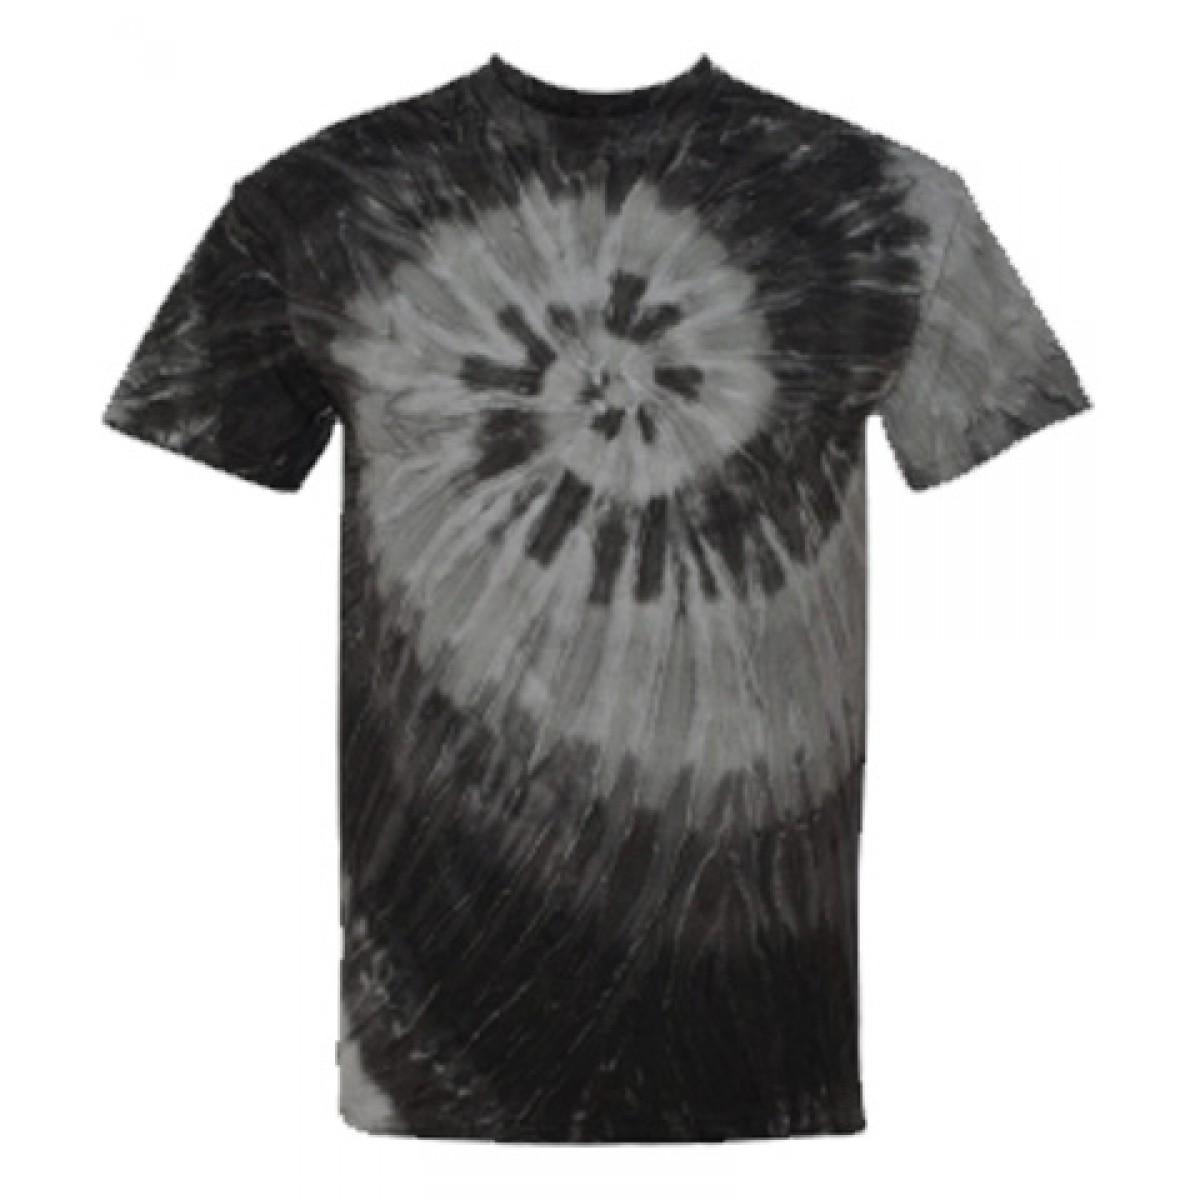 Blue or Black Ripple Tie Dye T-Shirt-White/Black-M